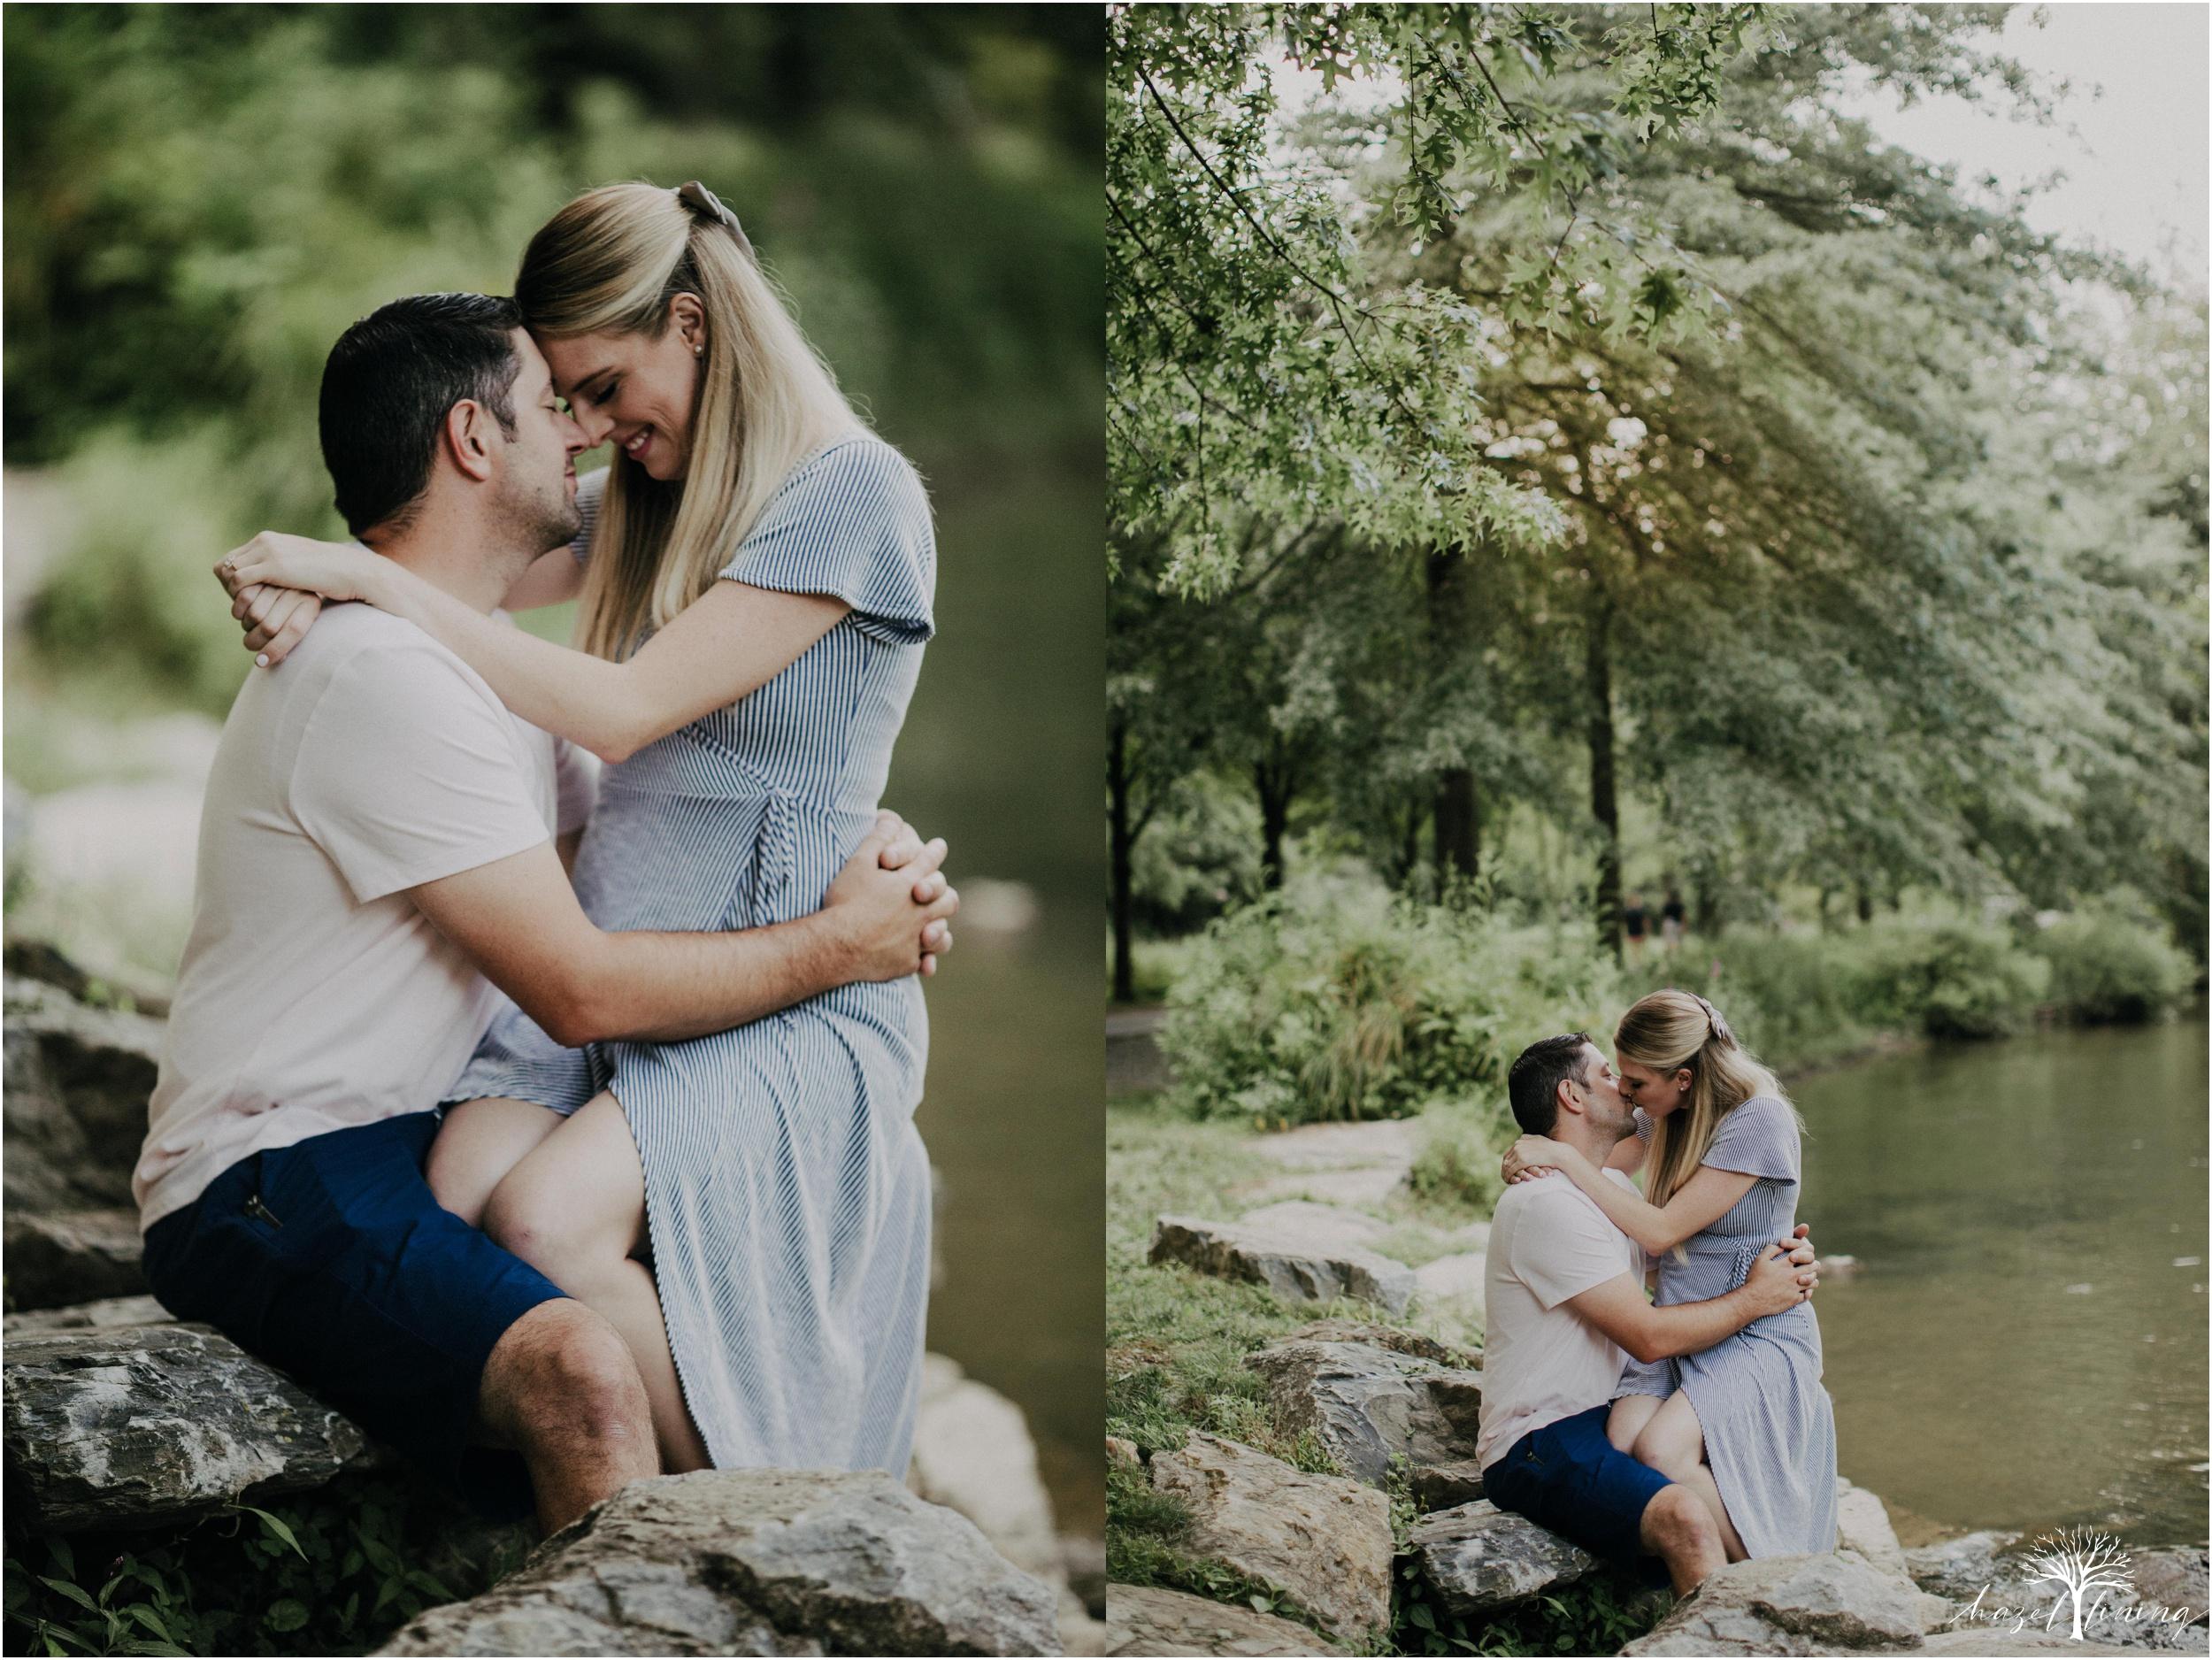 ashley-fillmore-steve-reimer-trexler-nature-preserve-summer-engagement-session-schnecksville-pennsylvania-hazel-lining-photography-destination-elopement-wedding-engagement-photography_0008.jpg